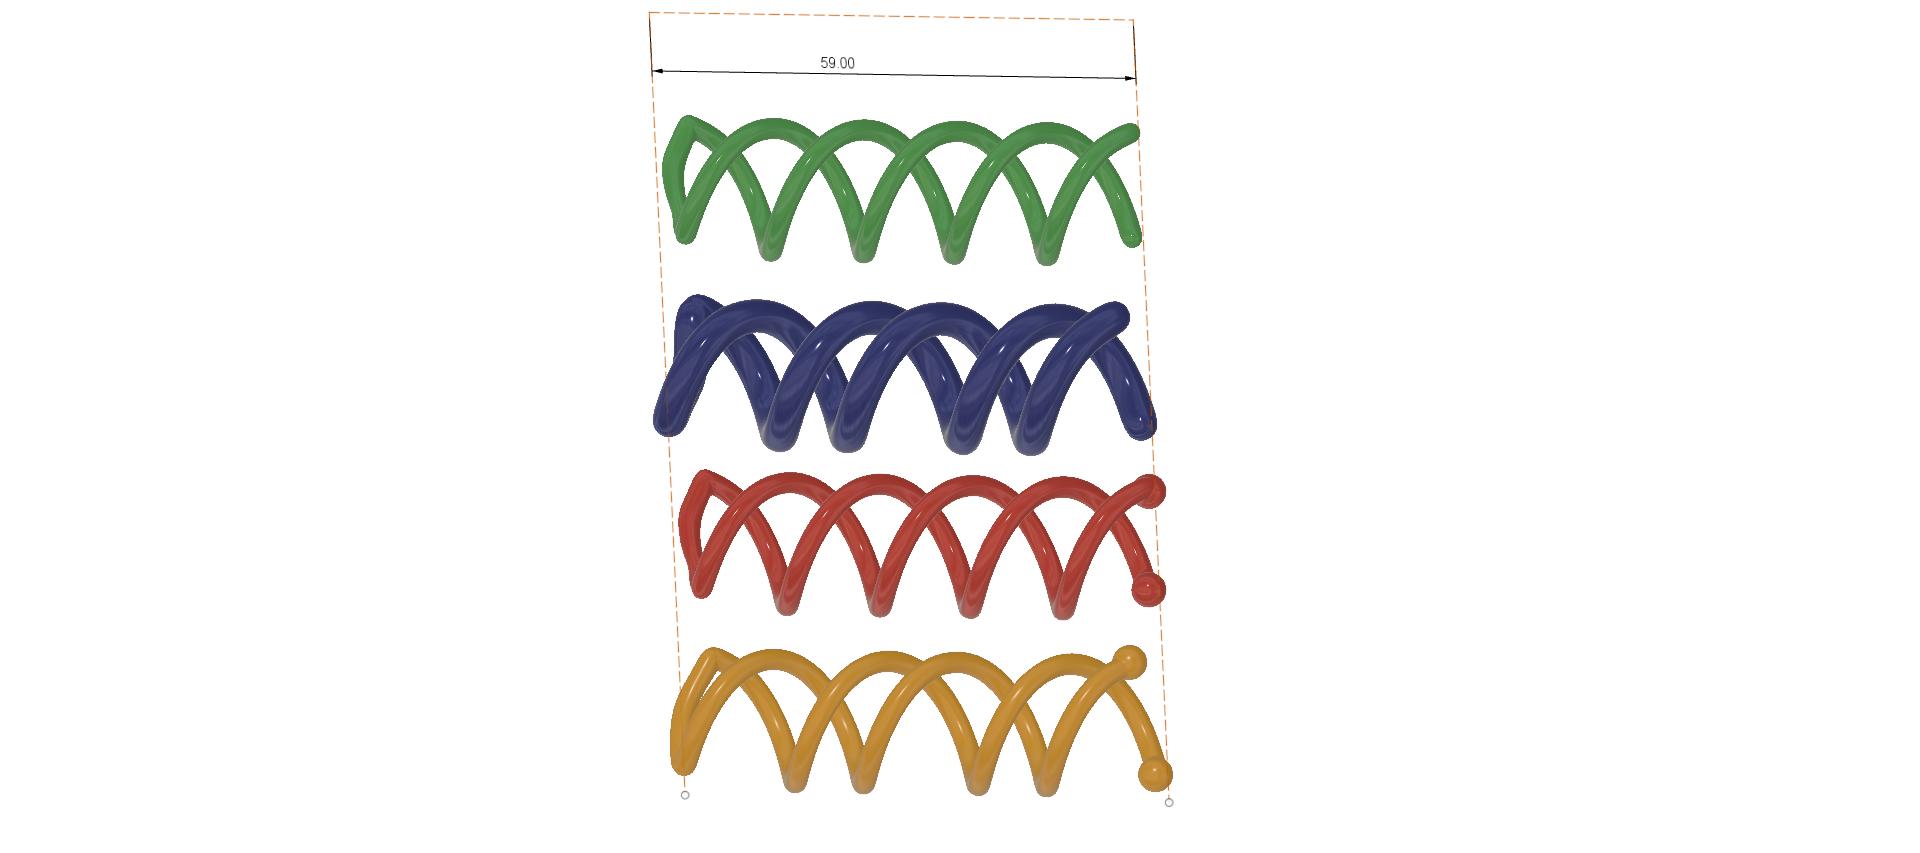 Female braid hair 02 v4-d21.png Download STL file Spiral Spin Screw Hair Pins Clip Twist Barrette female WEDDING Accessory hair braid hair styling roller hair accessories for girl headdress weaving tool fbh-02 3d print cnc • Design to 3D print, Dzusto